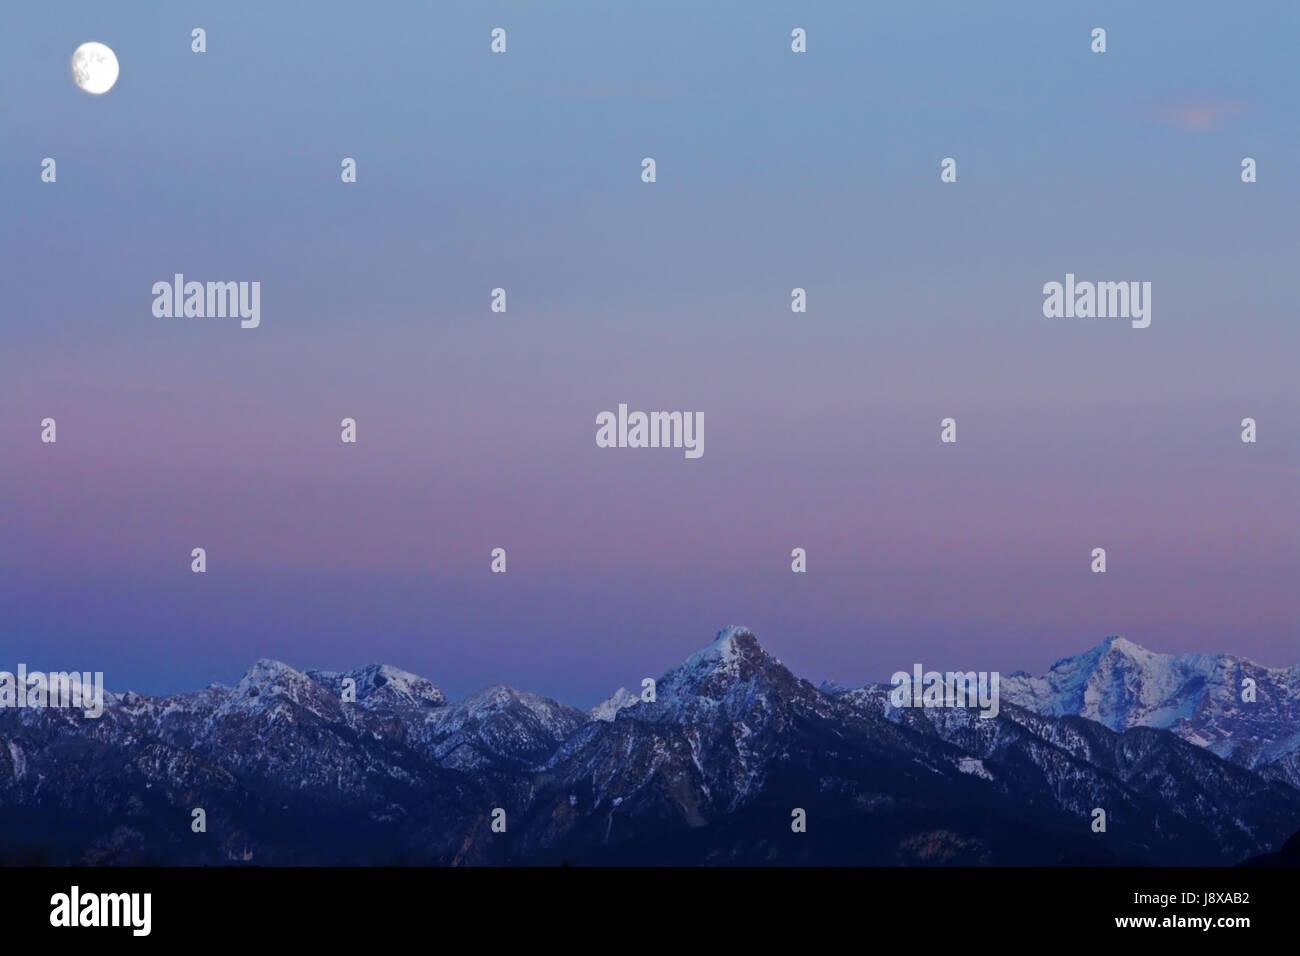 mountains, alps, moon, evening, snow, mountain, wait, waiting, blue, shine, - Stock Image